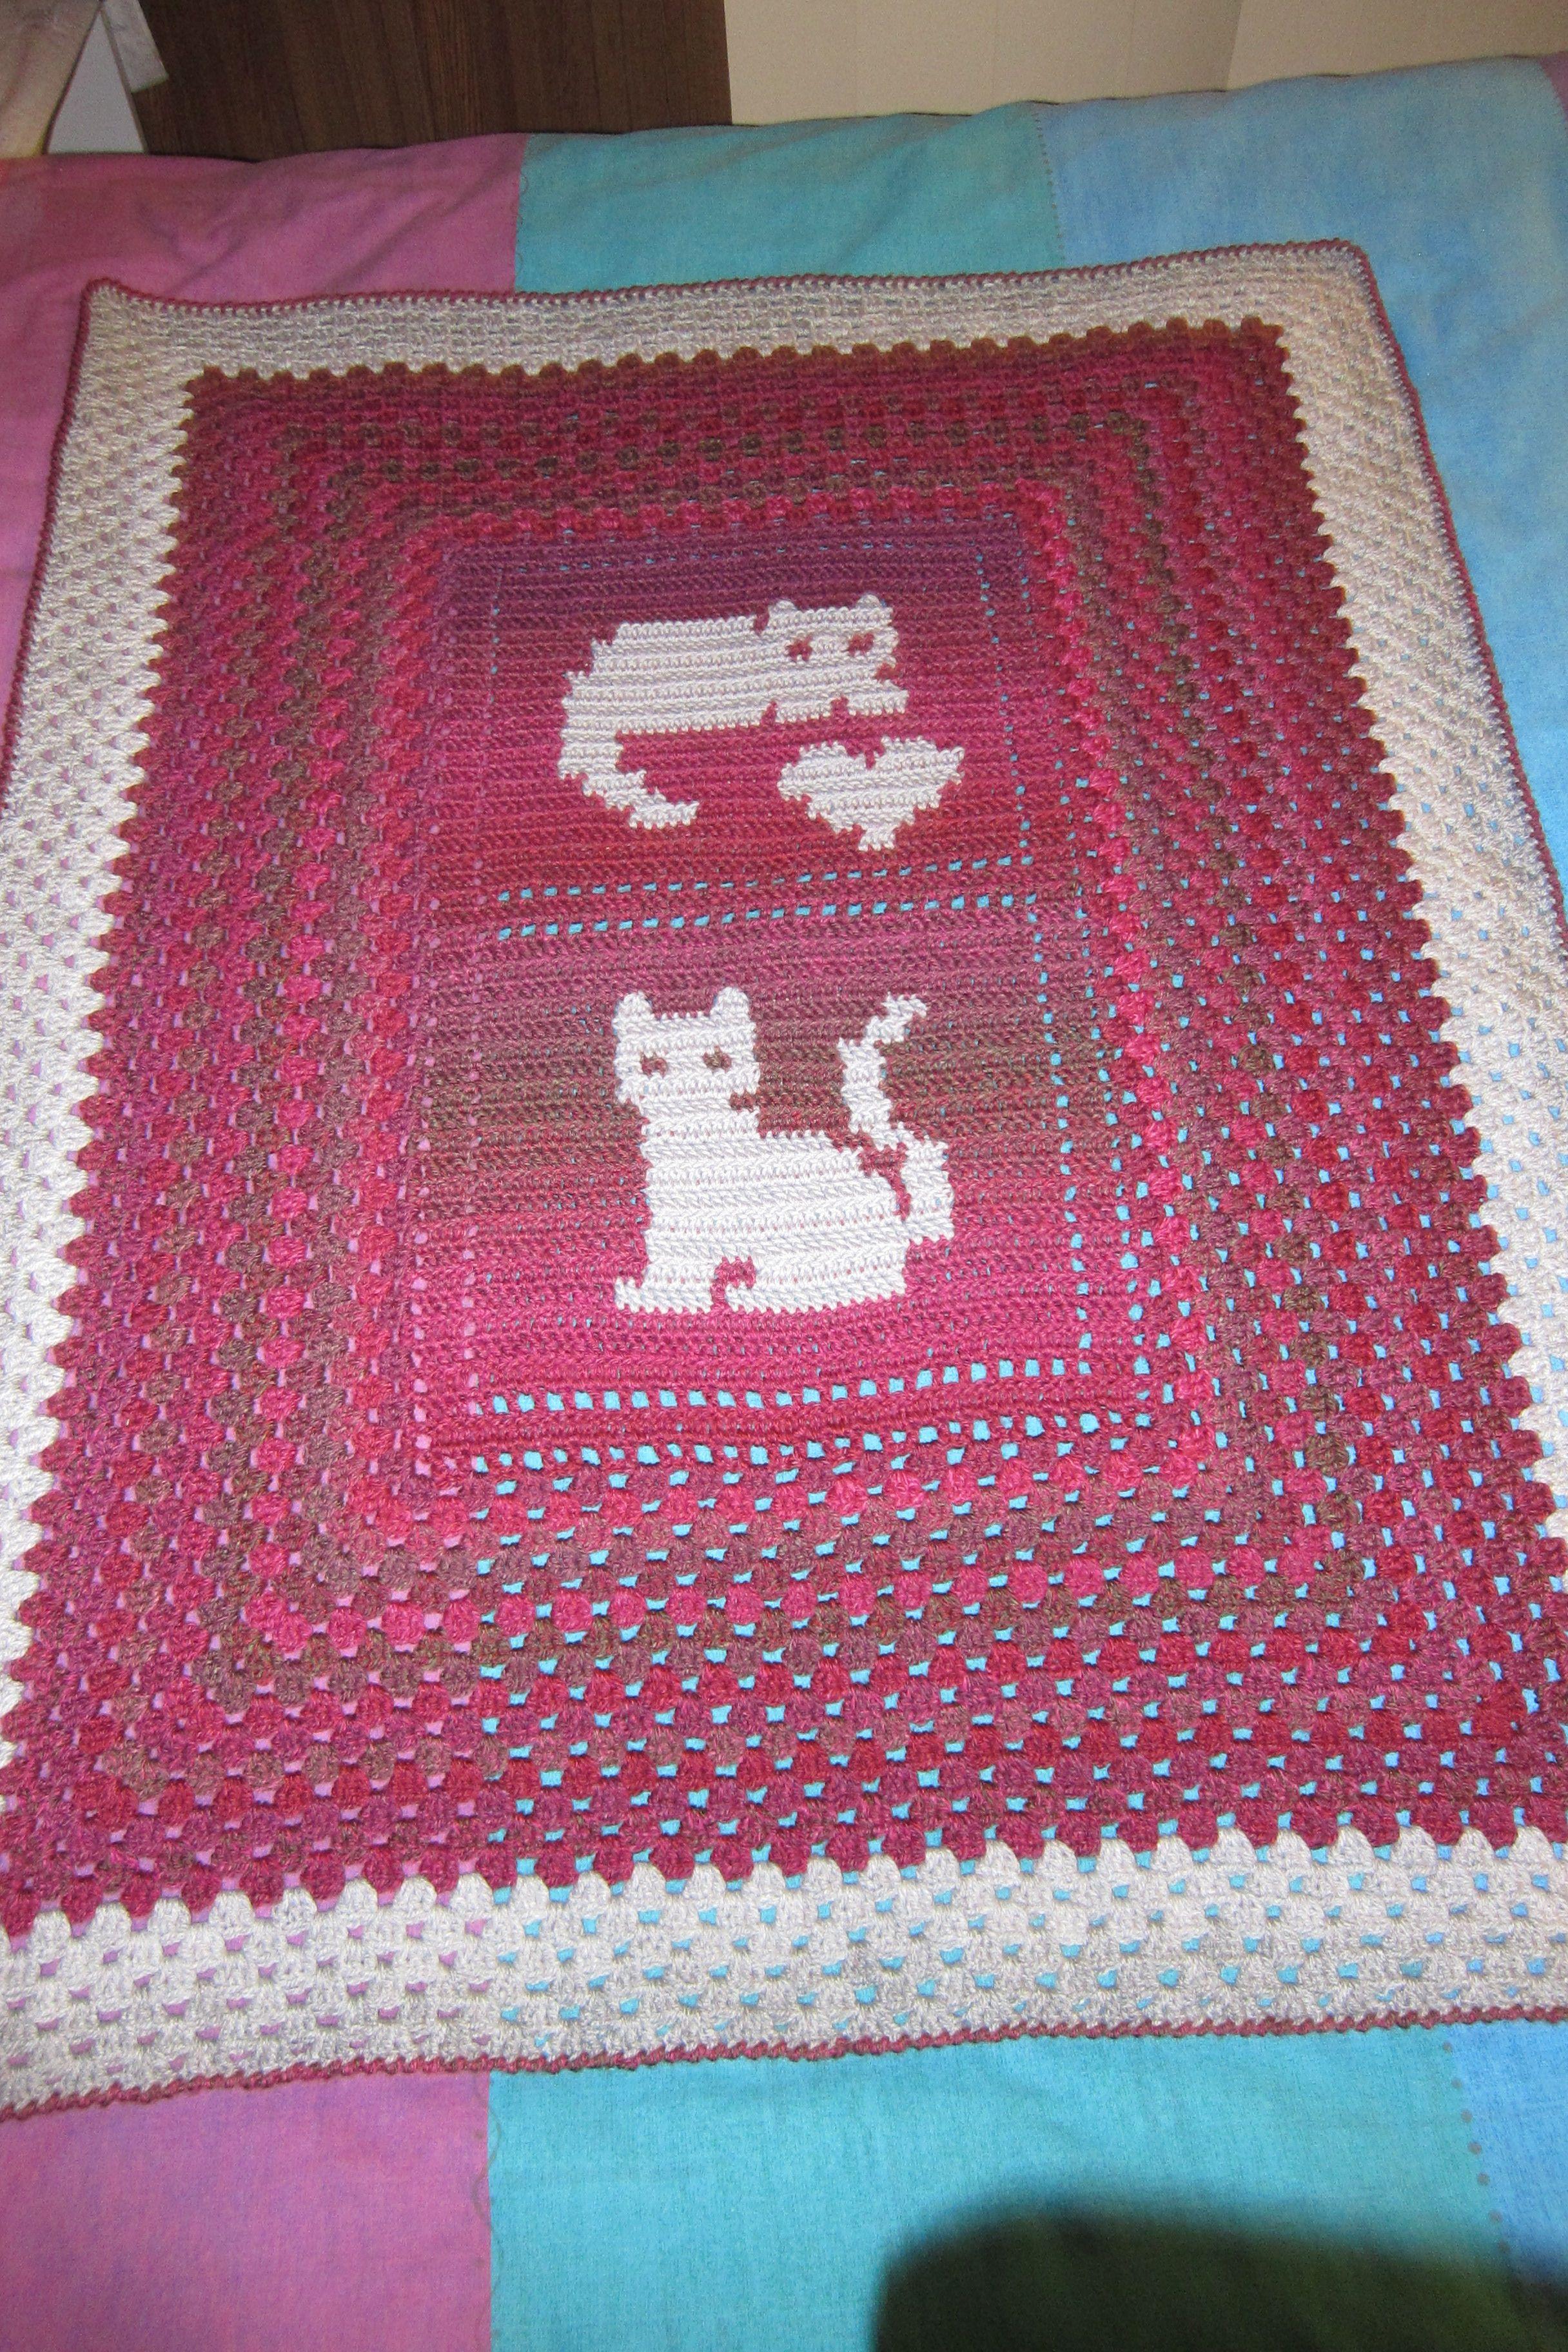 Crochet cat knee rug filet crochet adapted for a more